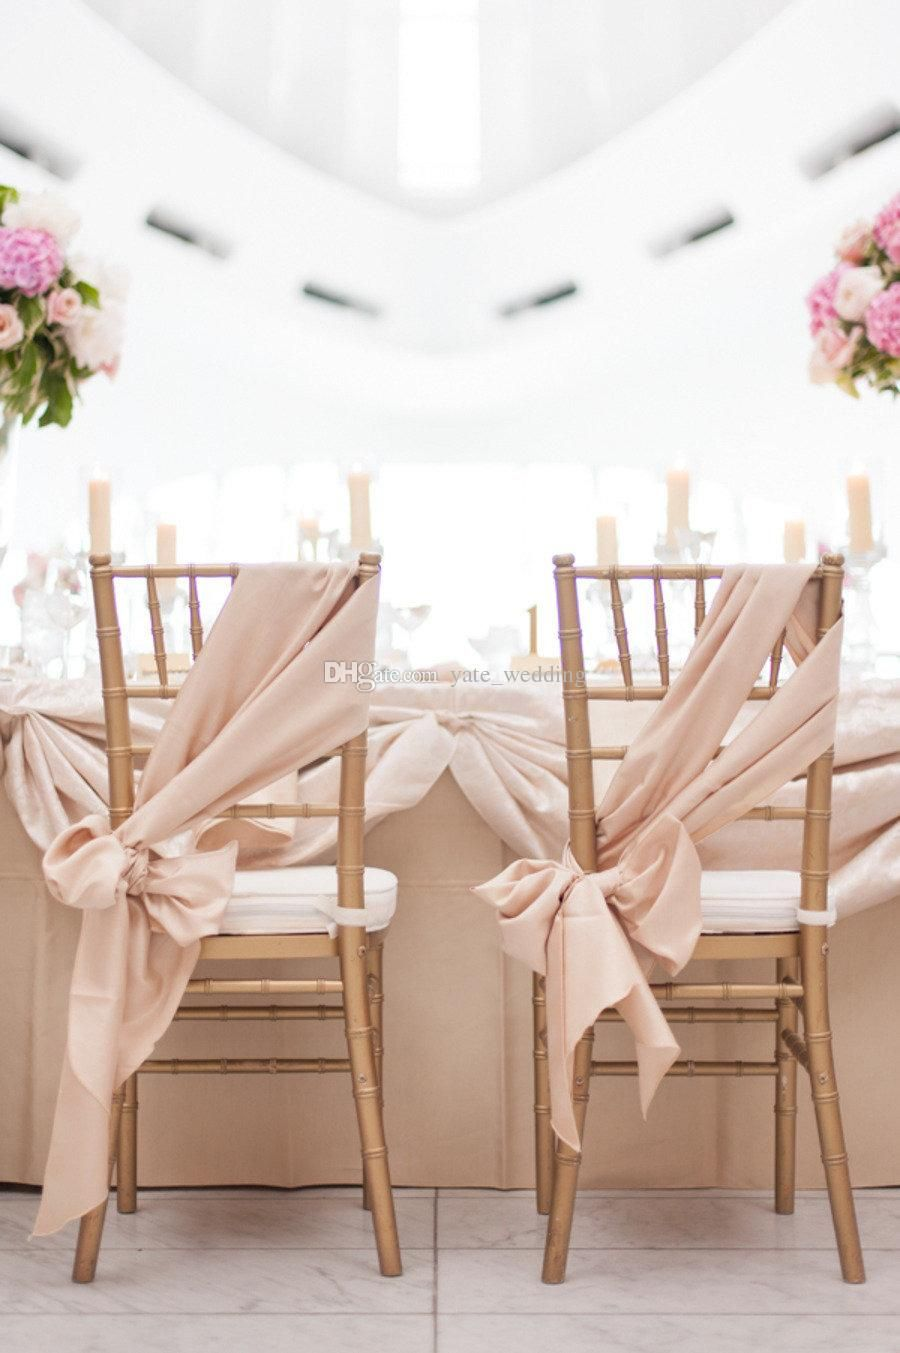 Free shipping 3878piecebuy wholesale champagne chair sashes diy free shipping 3878piecebuy wholesale champagne chair sashes diy wedding chair decorations junglespirit Gallery